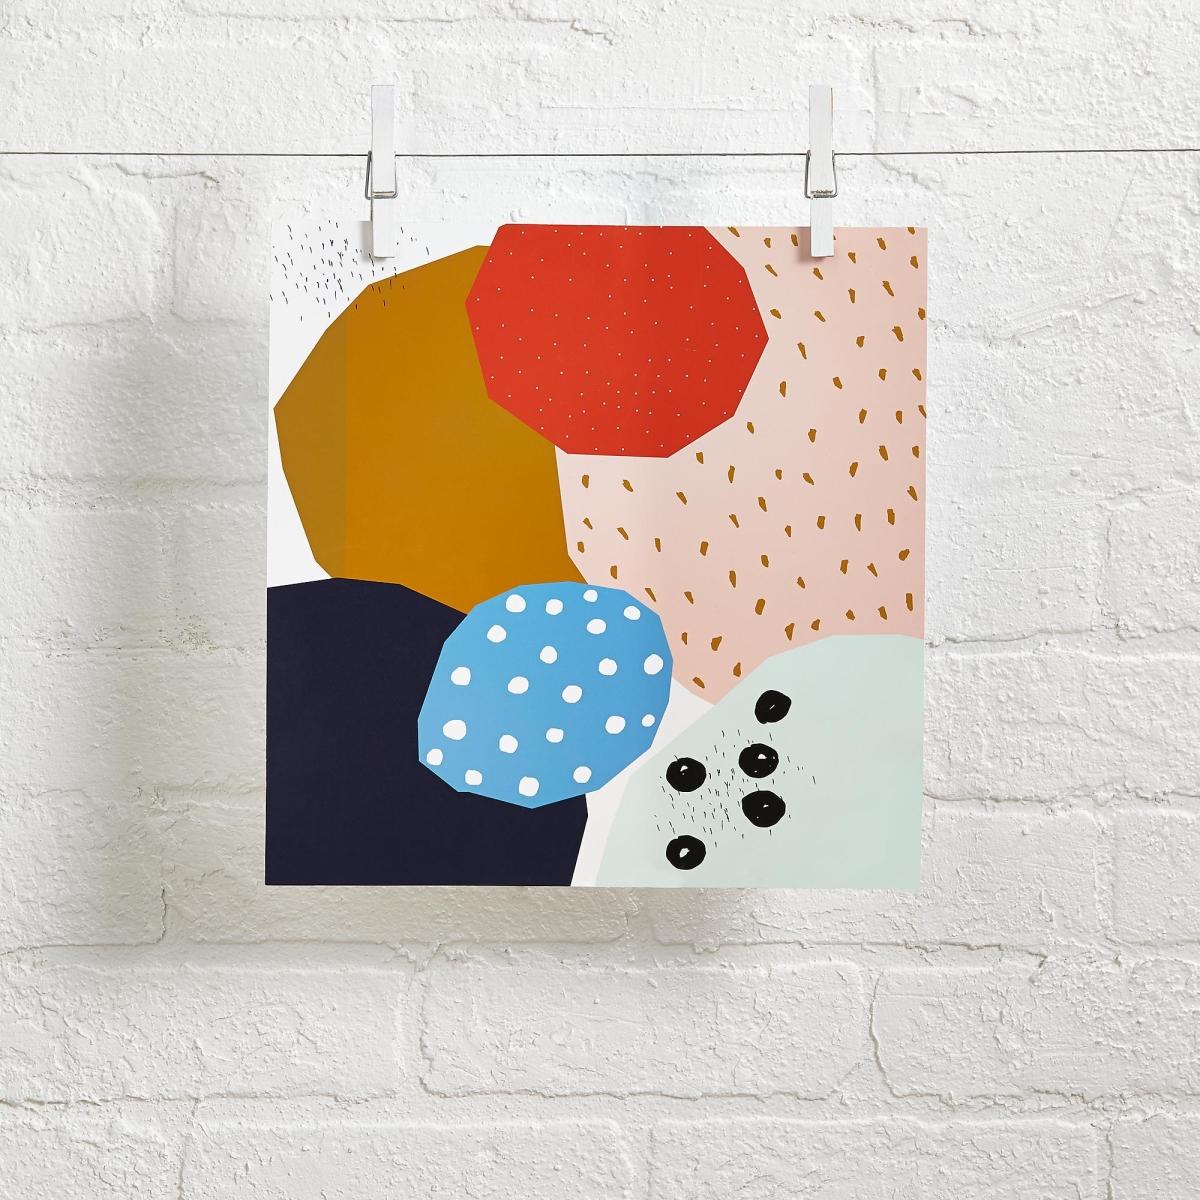 Abstract wall art by Ashley Goldberg